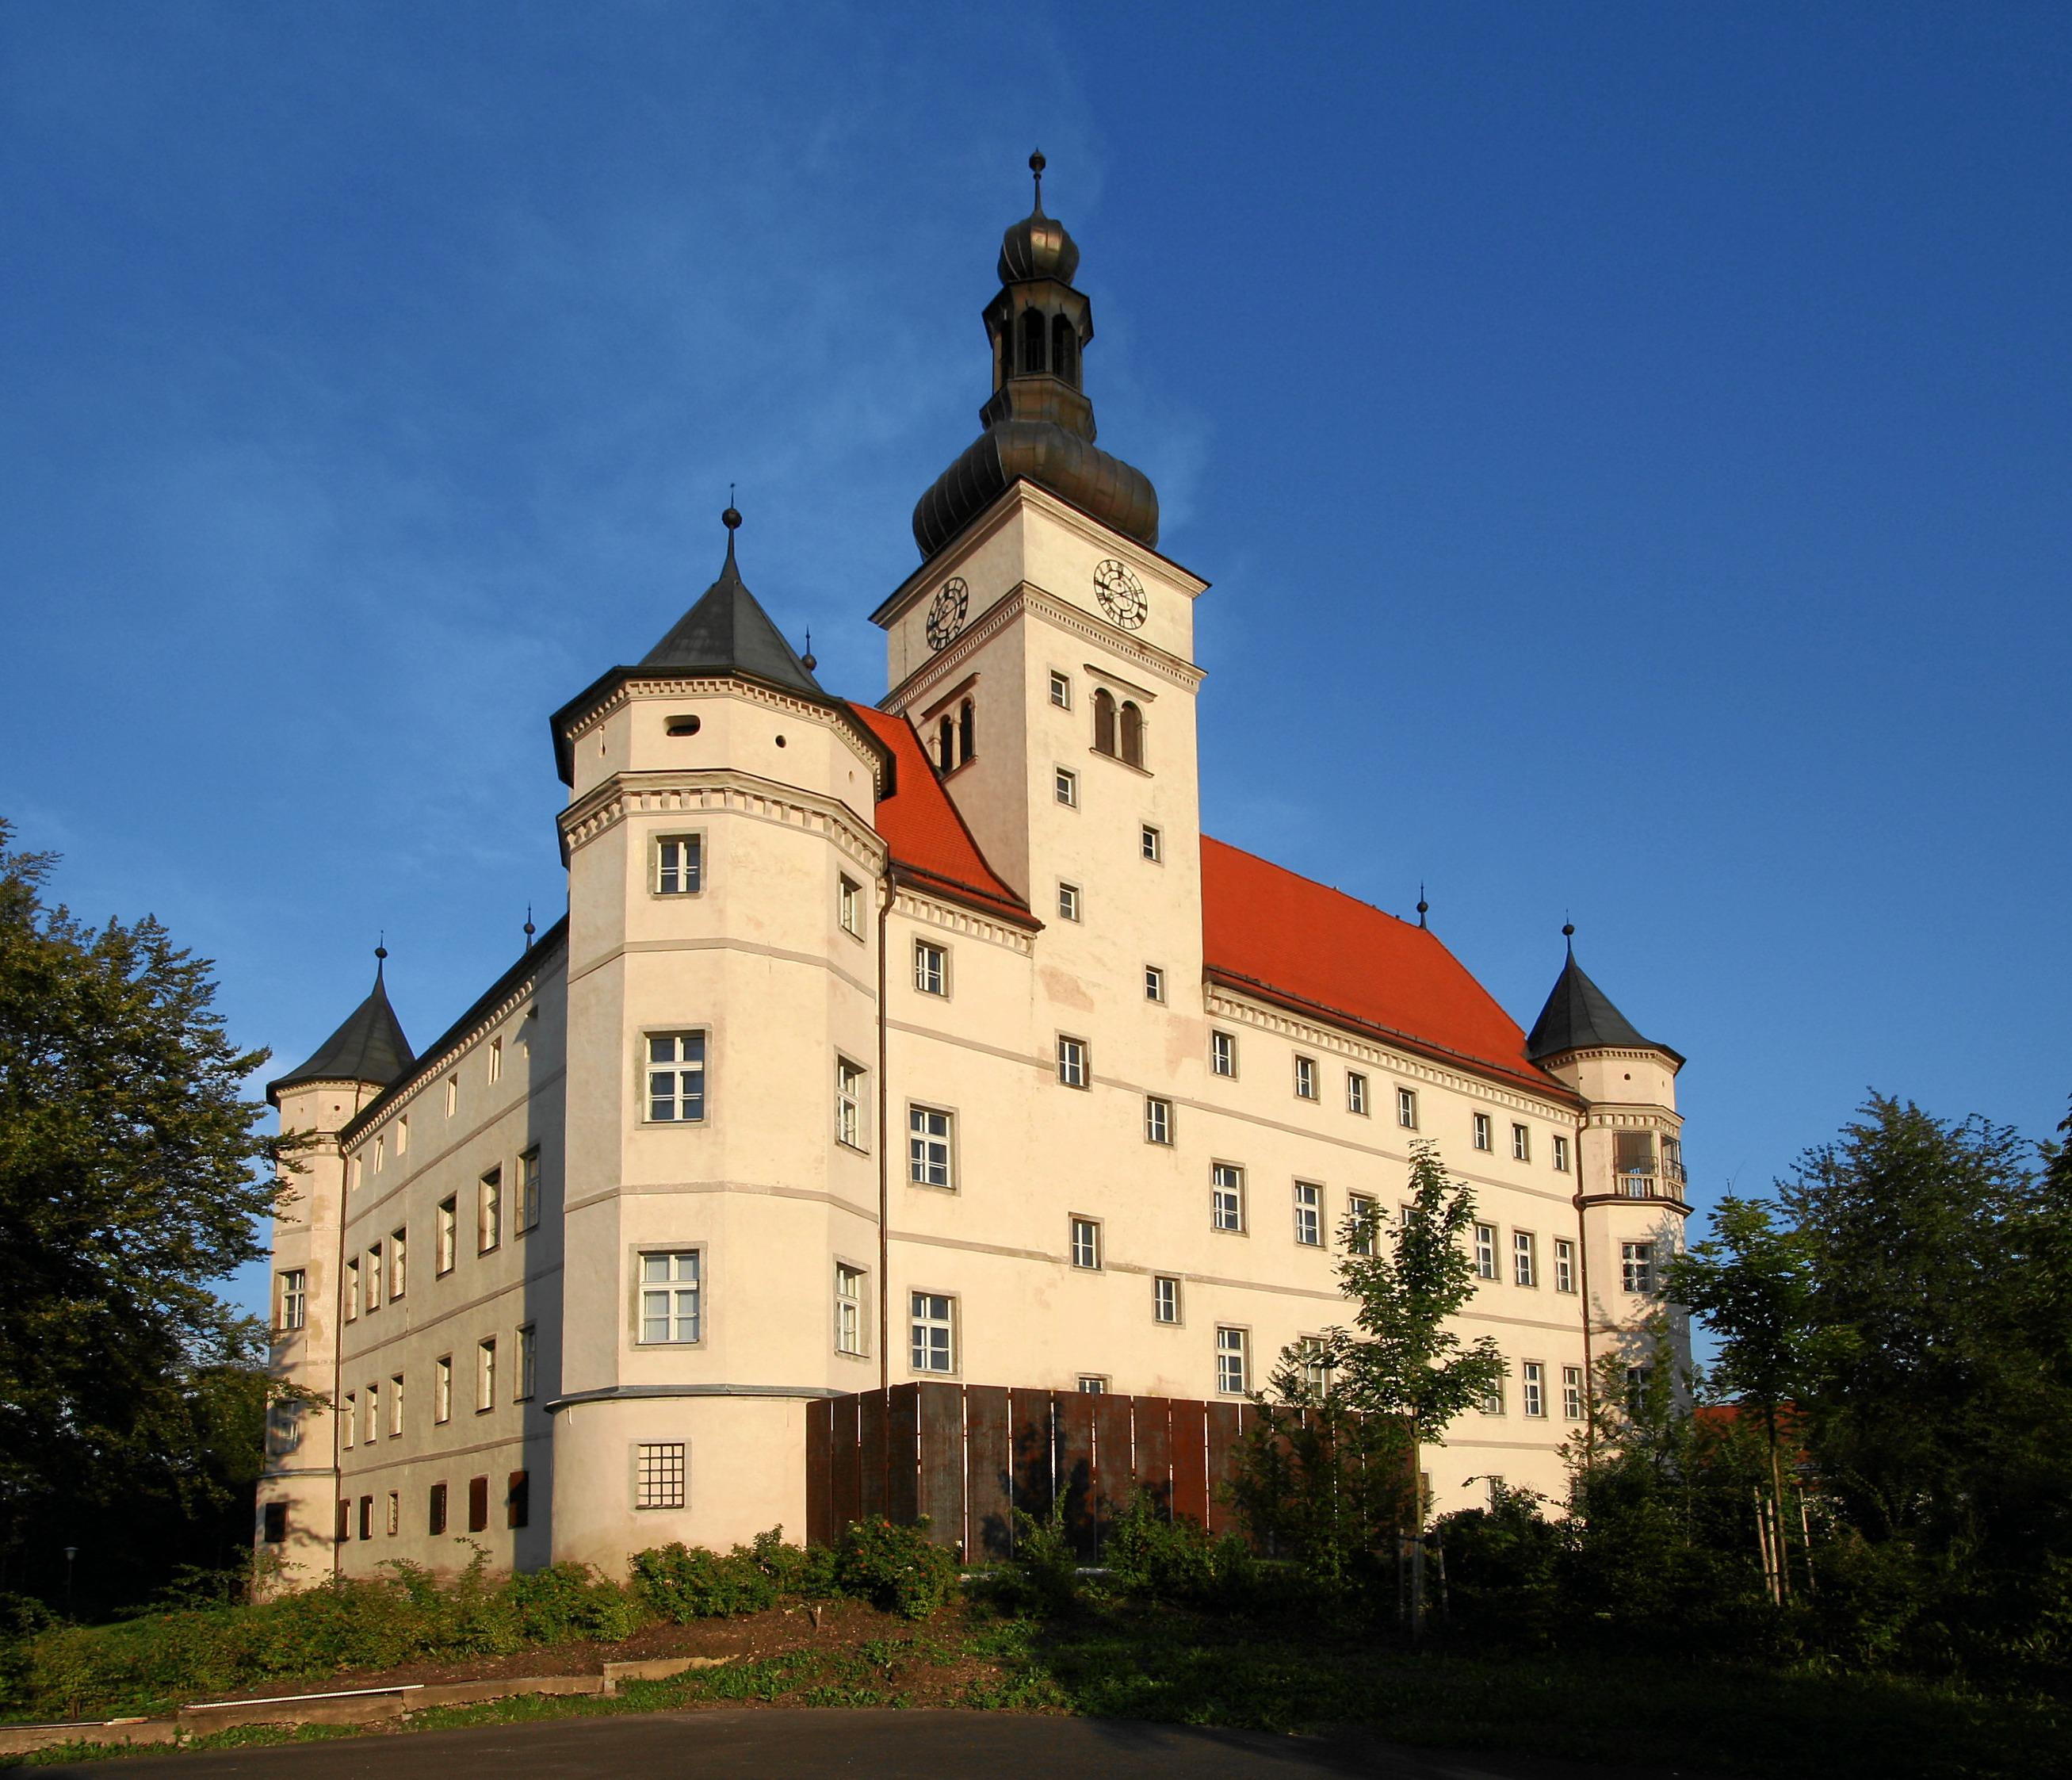 Slot Hartheim